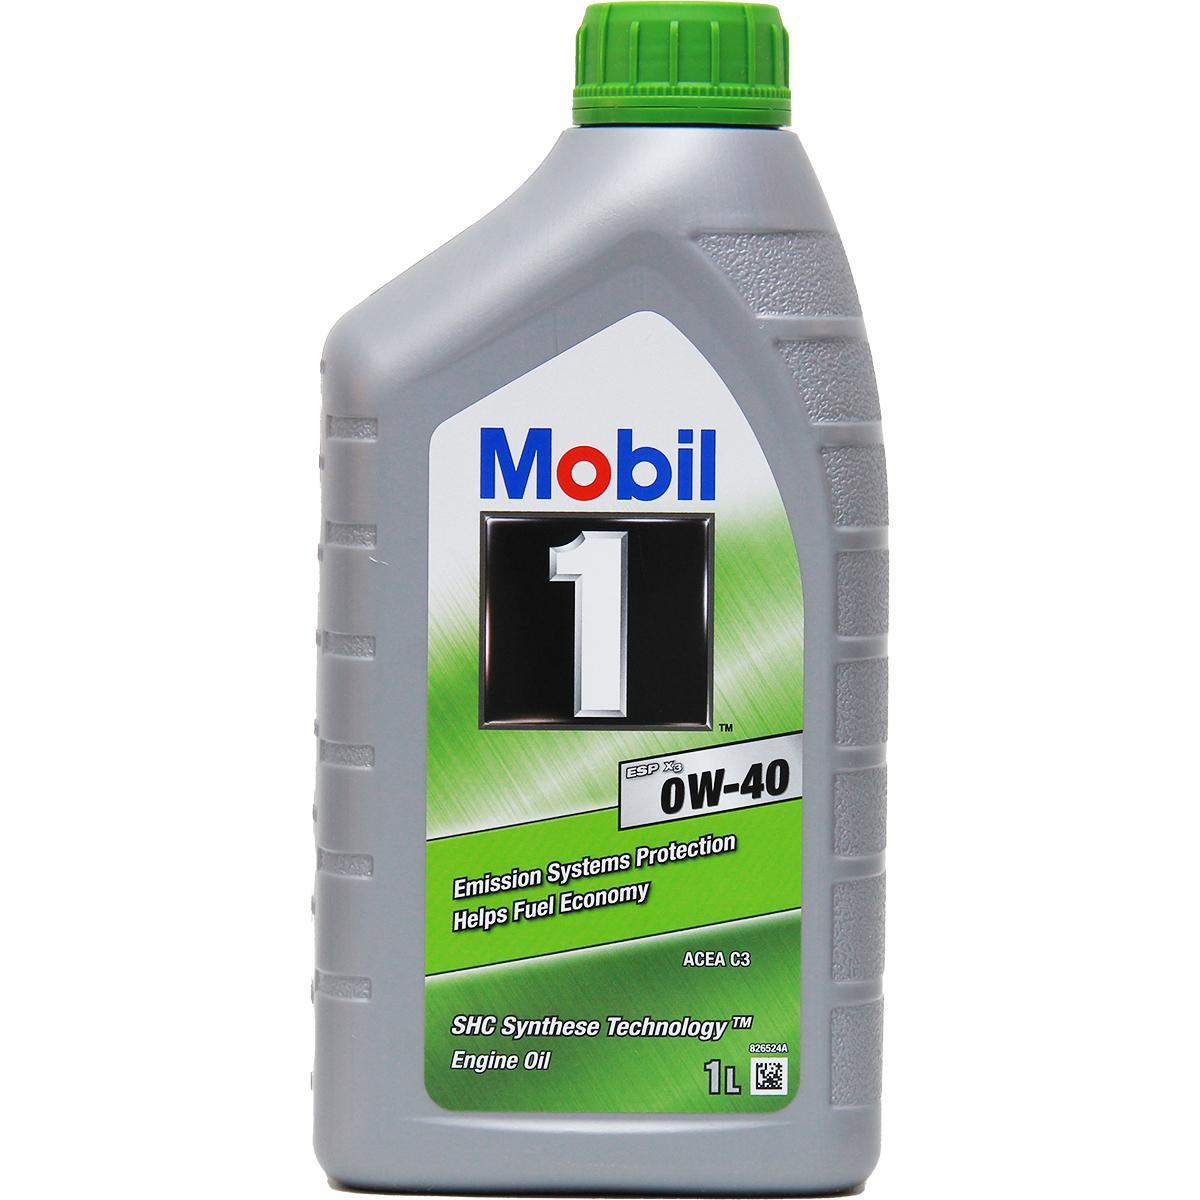 MBApproval22951 MOBIL 1, ESP 0W-40, 0W-40, 1l, Synthetiköl Motoröl 151500 günstig kaufen